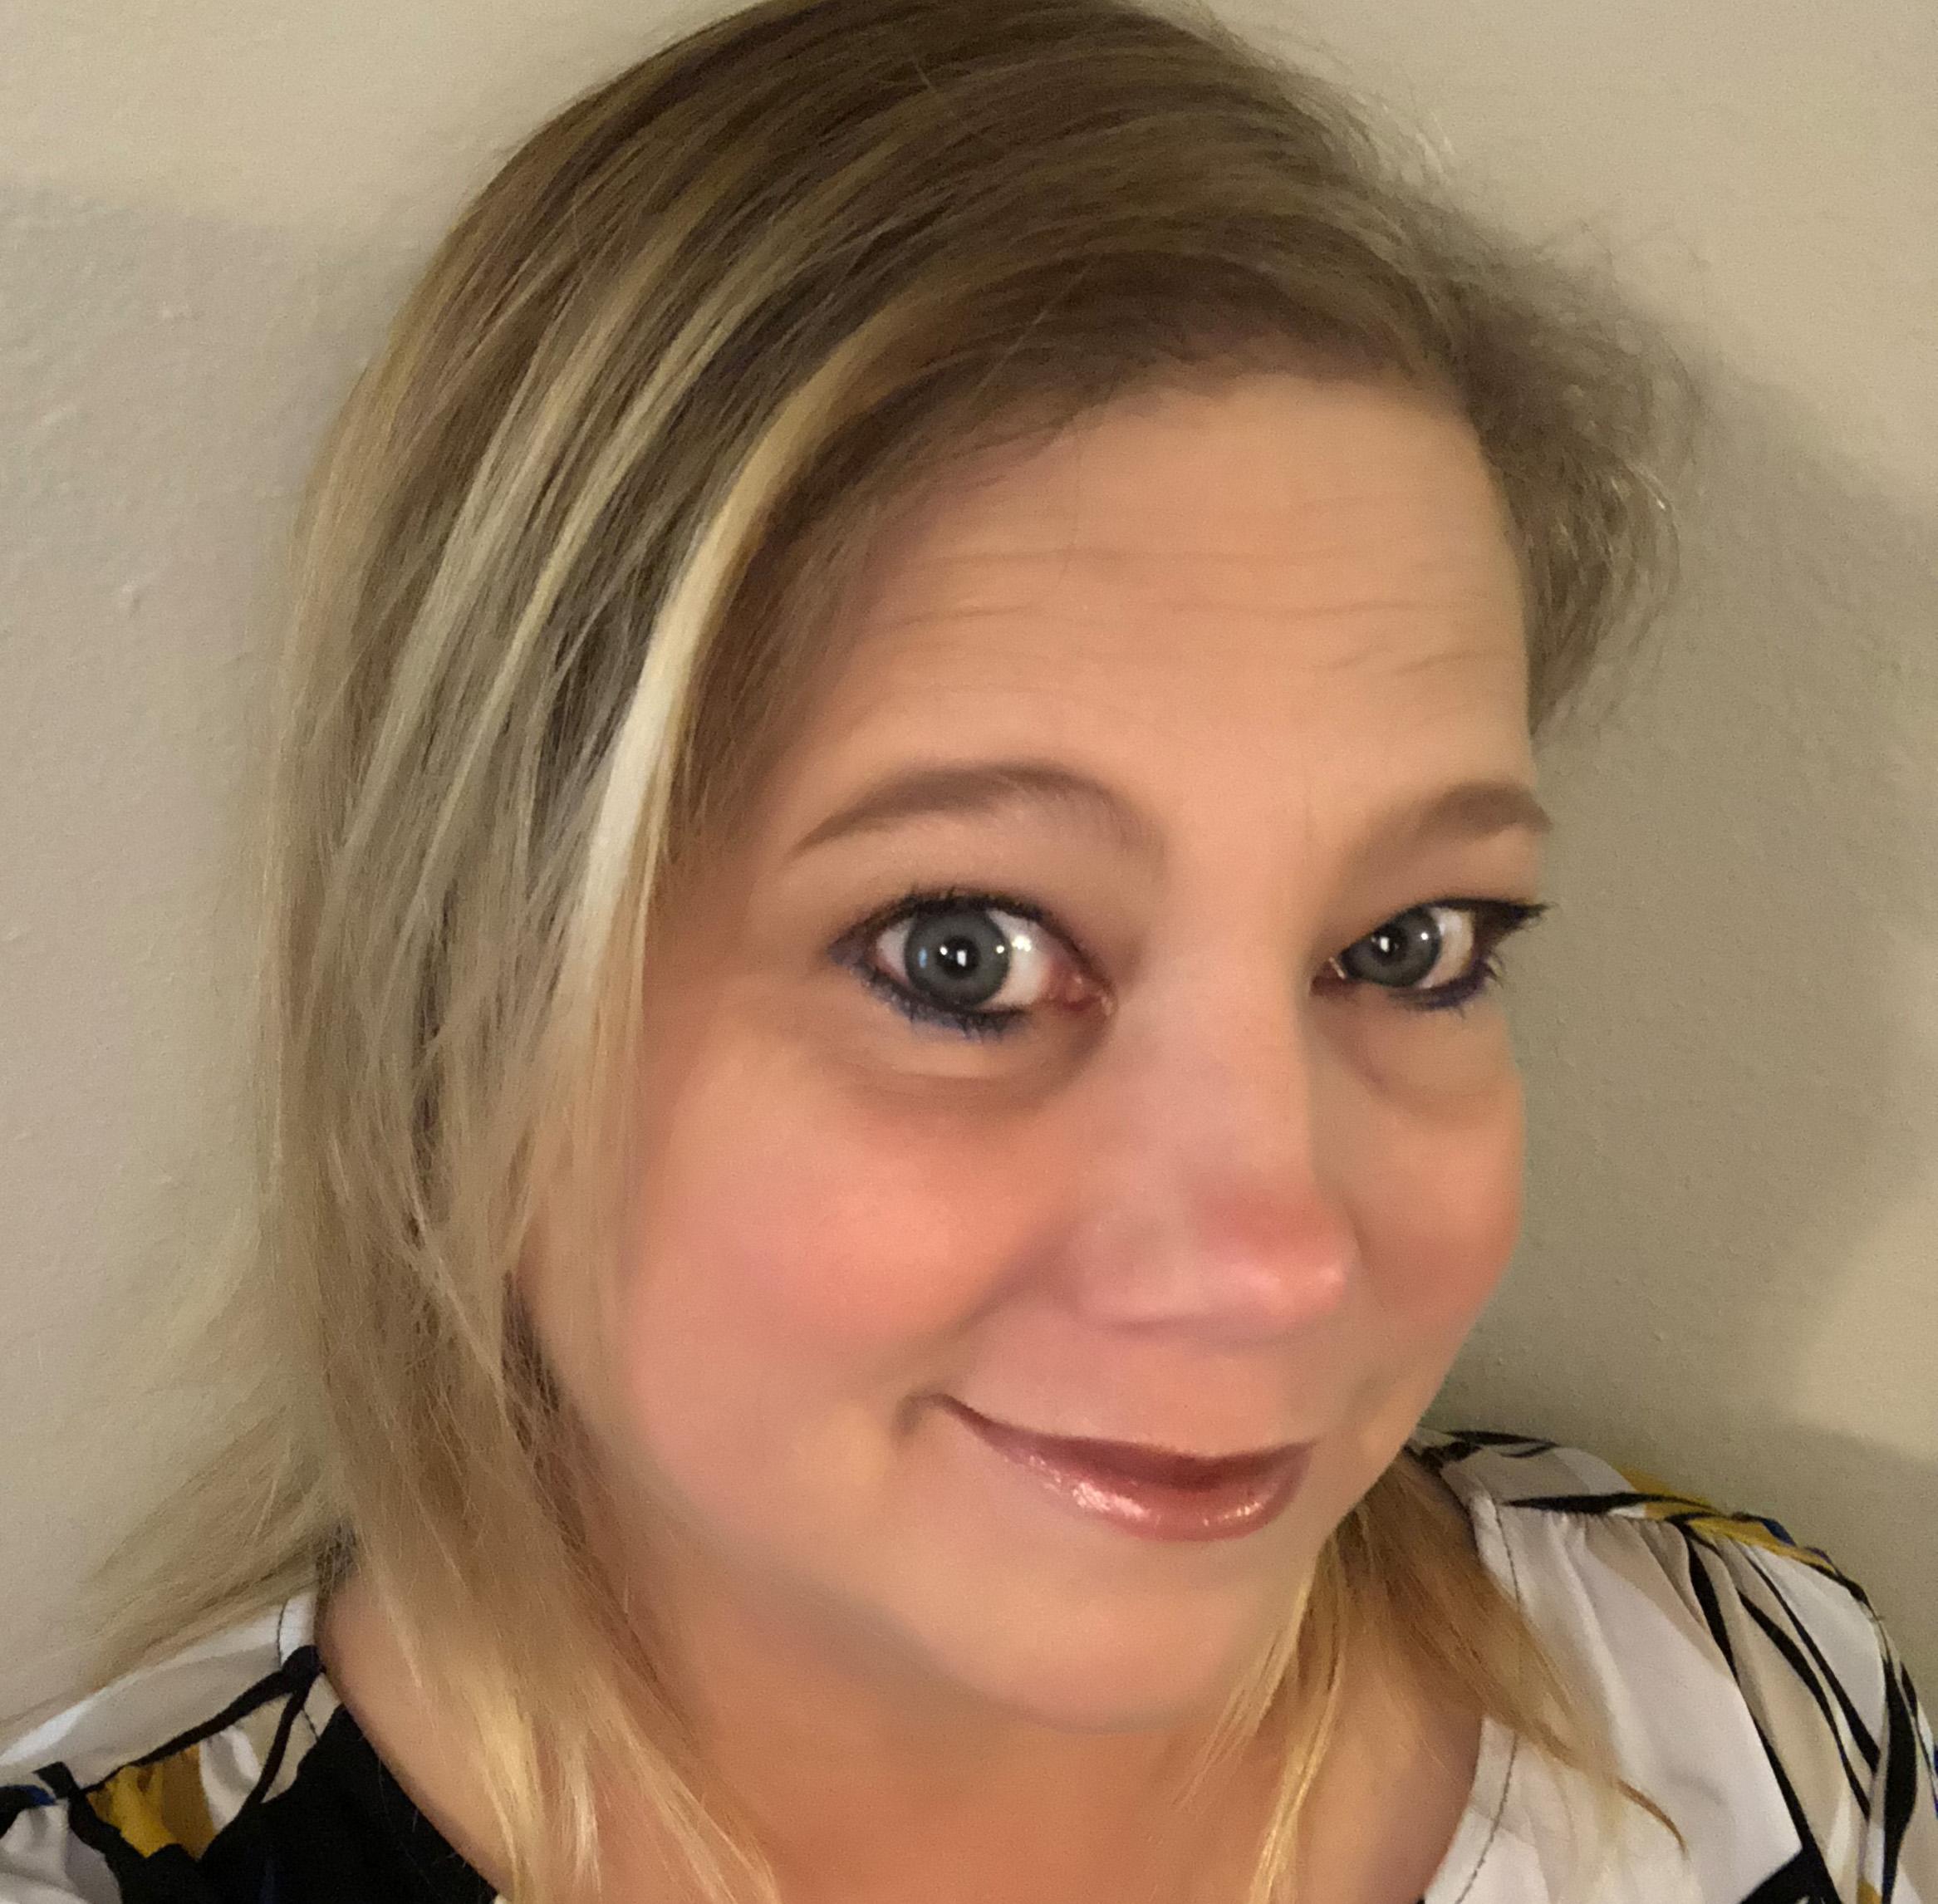 Nikki Stubbs   Health and Life Insurance Agent   Baton Rouge, LA 70818